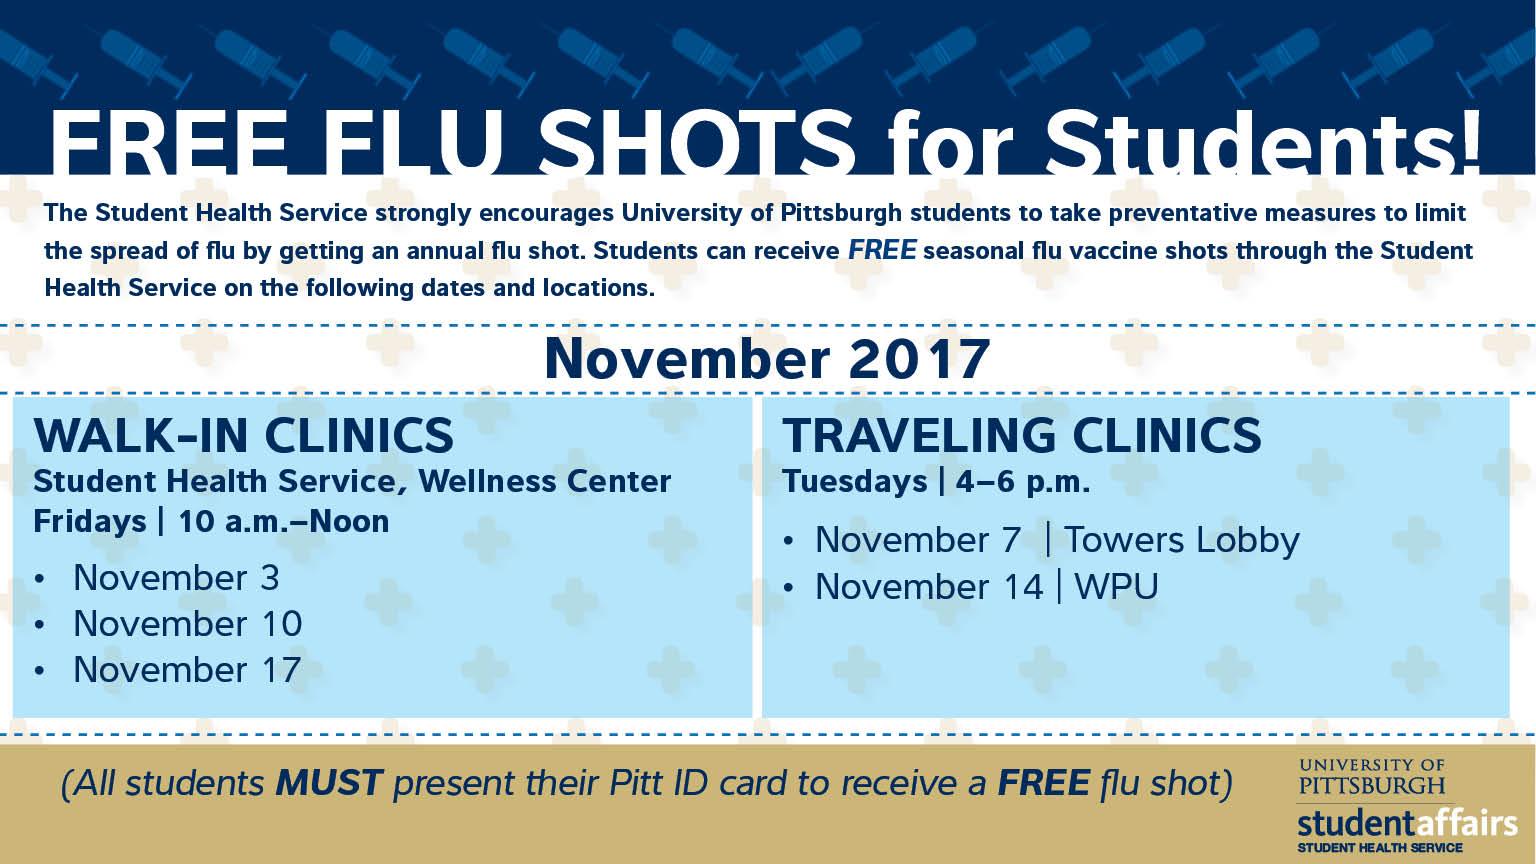 FluClinic_fall17_Nov 17